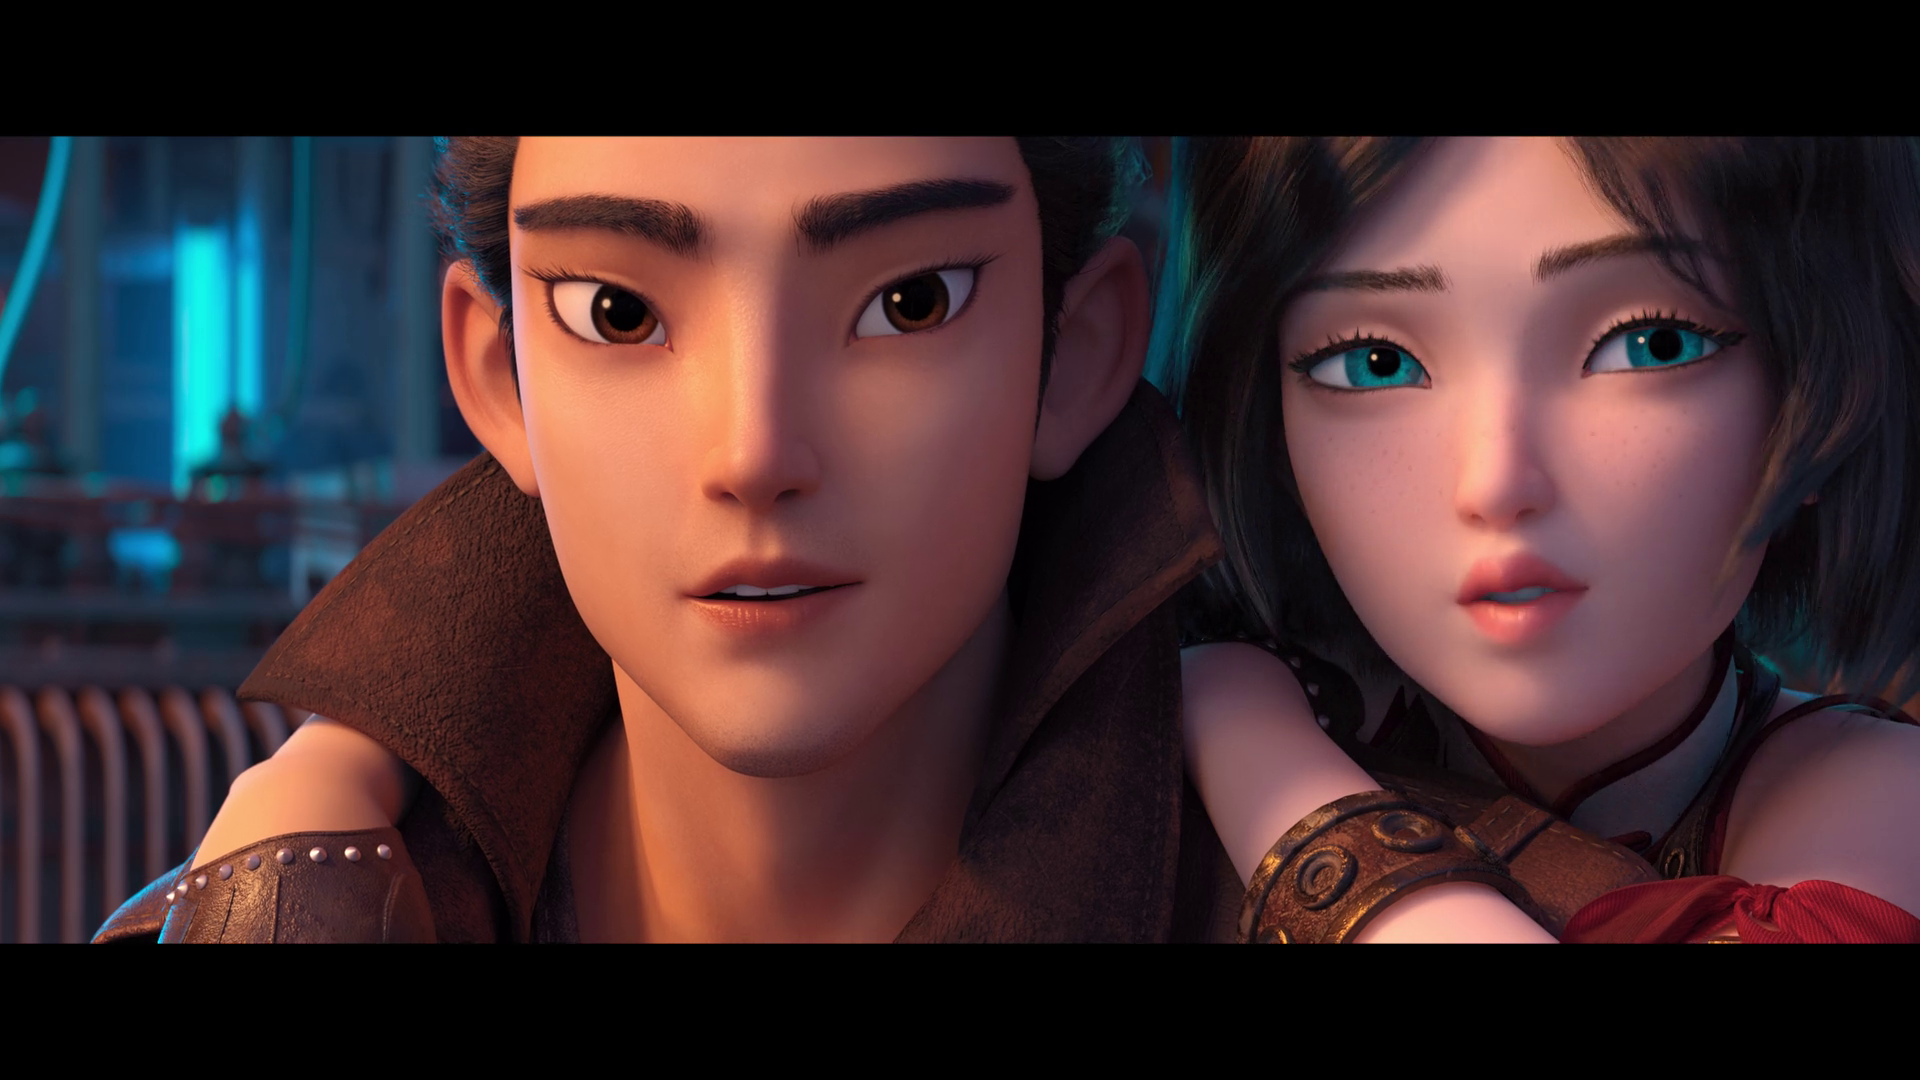 Nezha: El renacer de un dios (2021) 1080p WEB-DL Latino